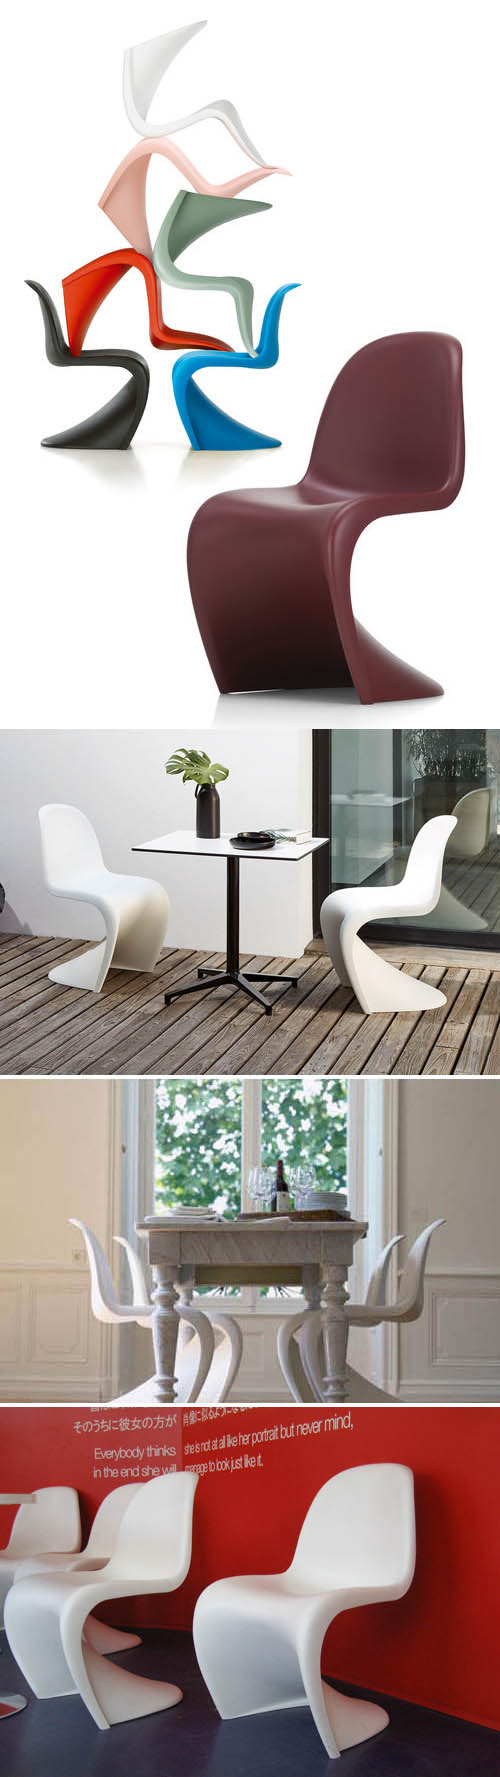 new panton chair vitra chairs - Panton Chair